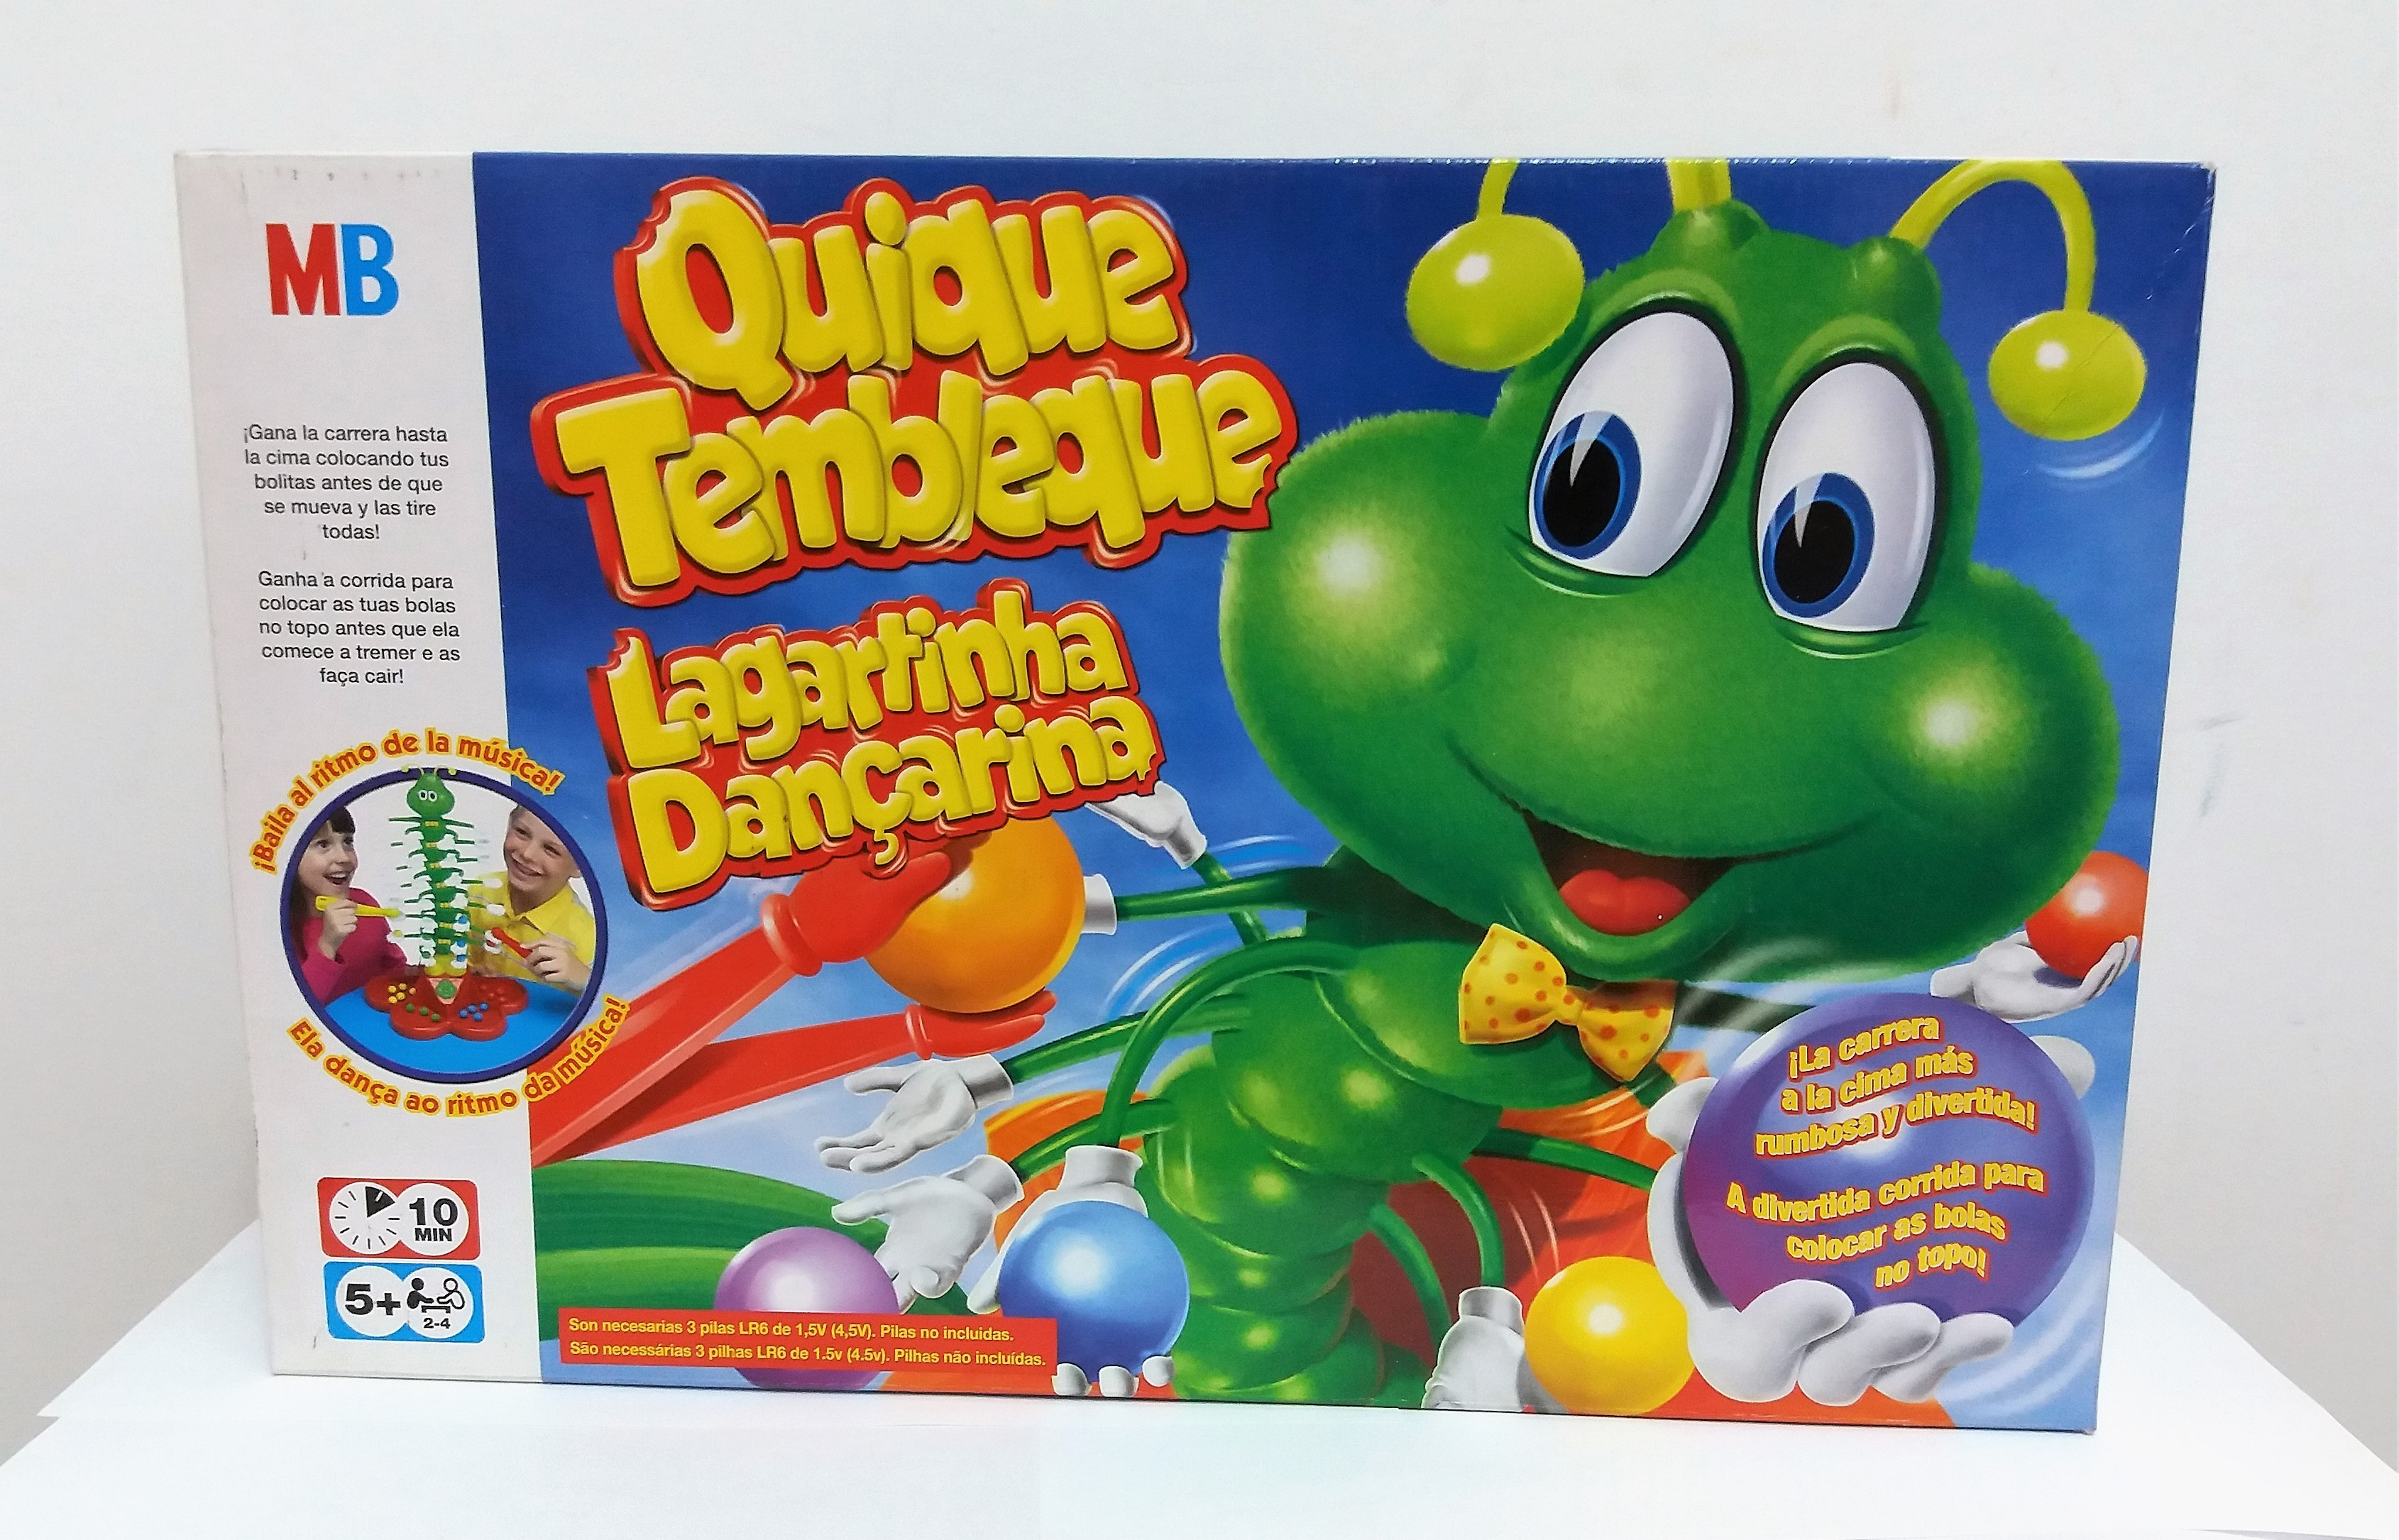 Juego De Mesa Quique Tembleque Hasbro Mb Comprar En Ca La Madrona